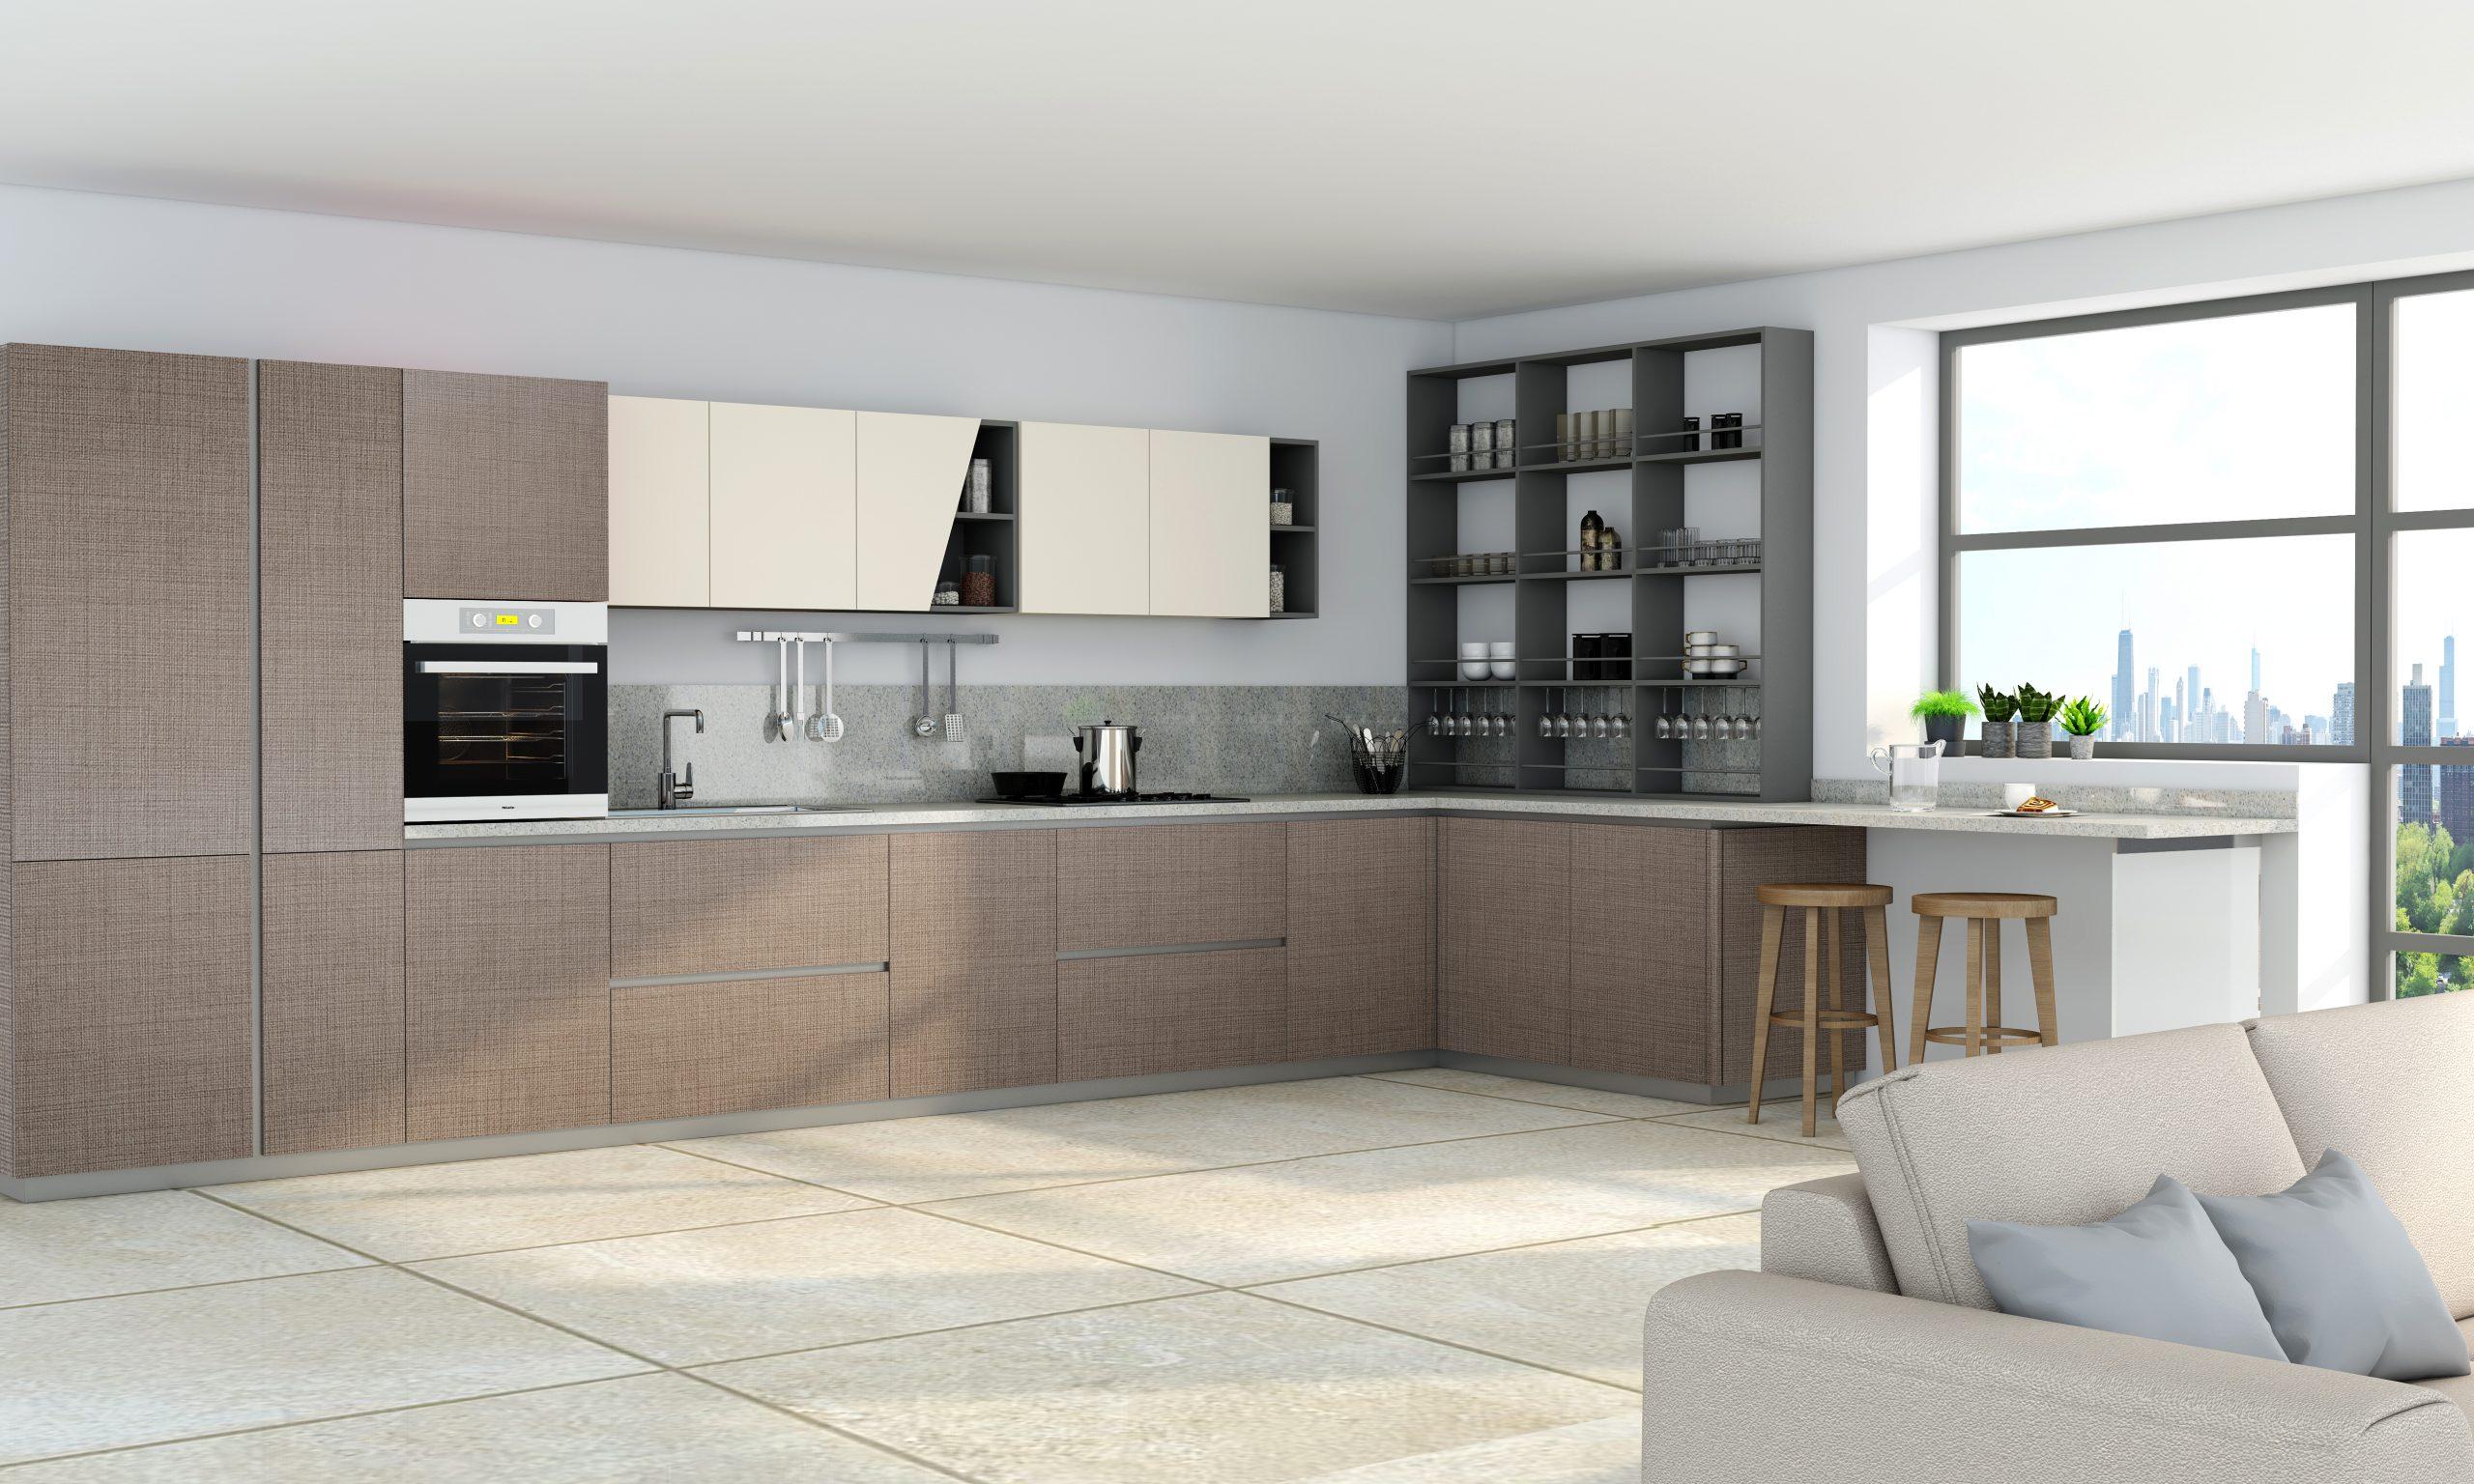 Premiumline Kitchen With Aluminium Handleless Profile in Cannella Textured Penelop and Cream Matt Finish